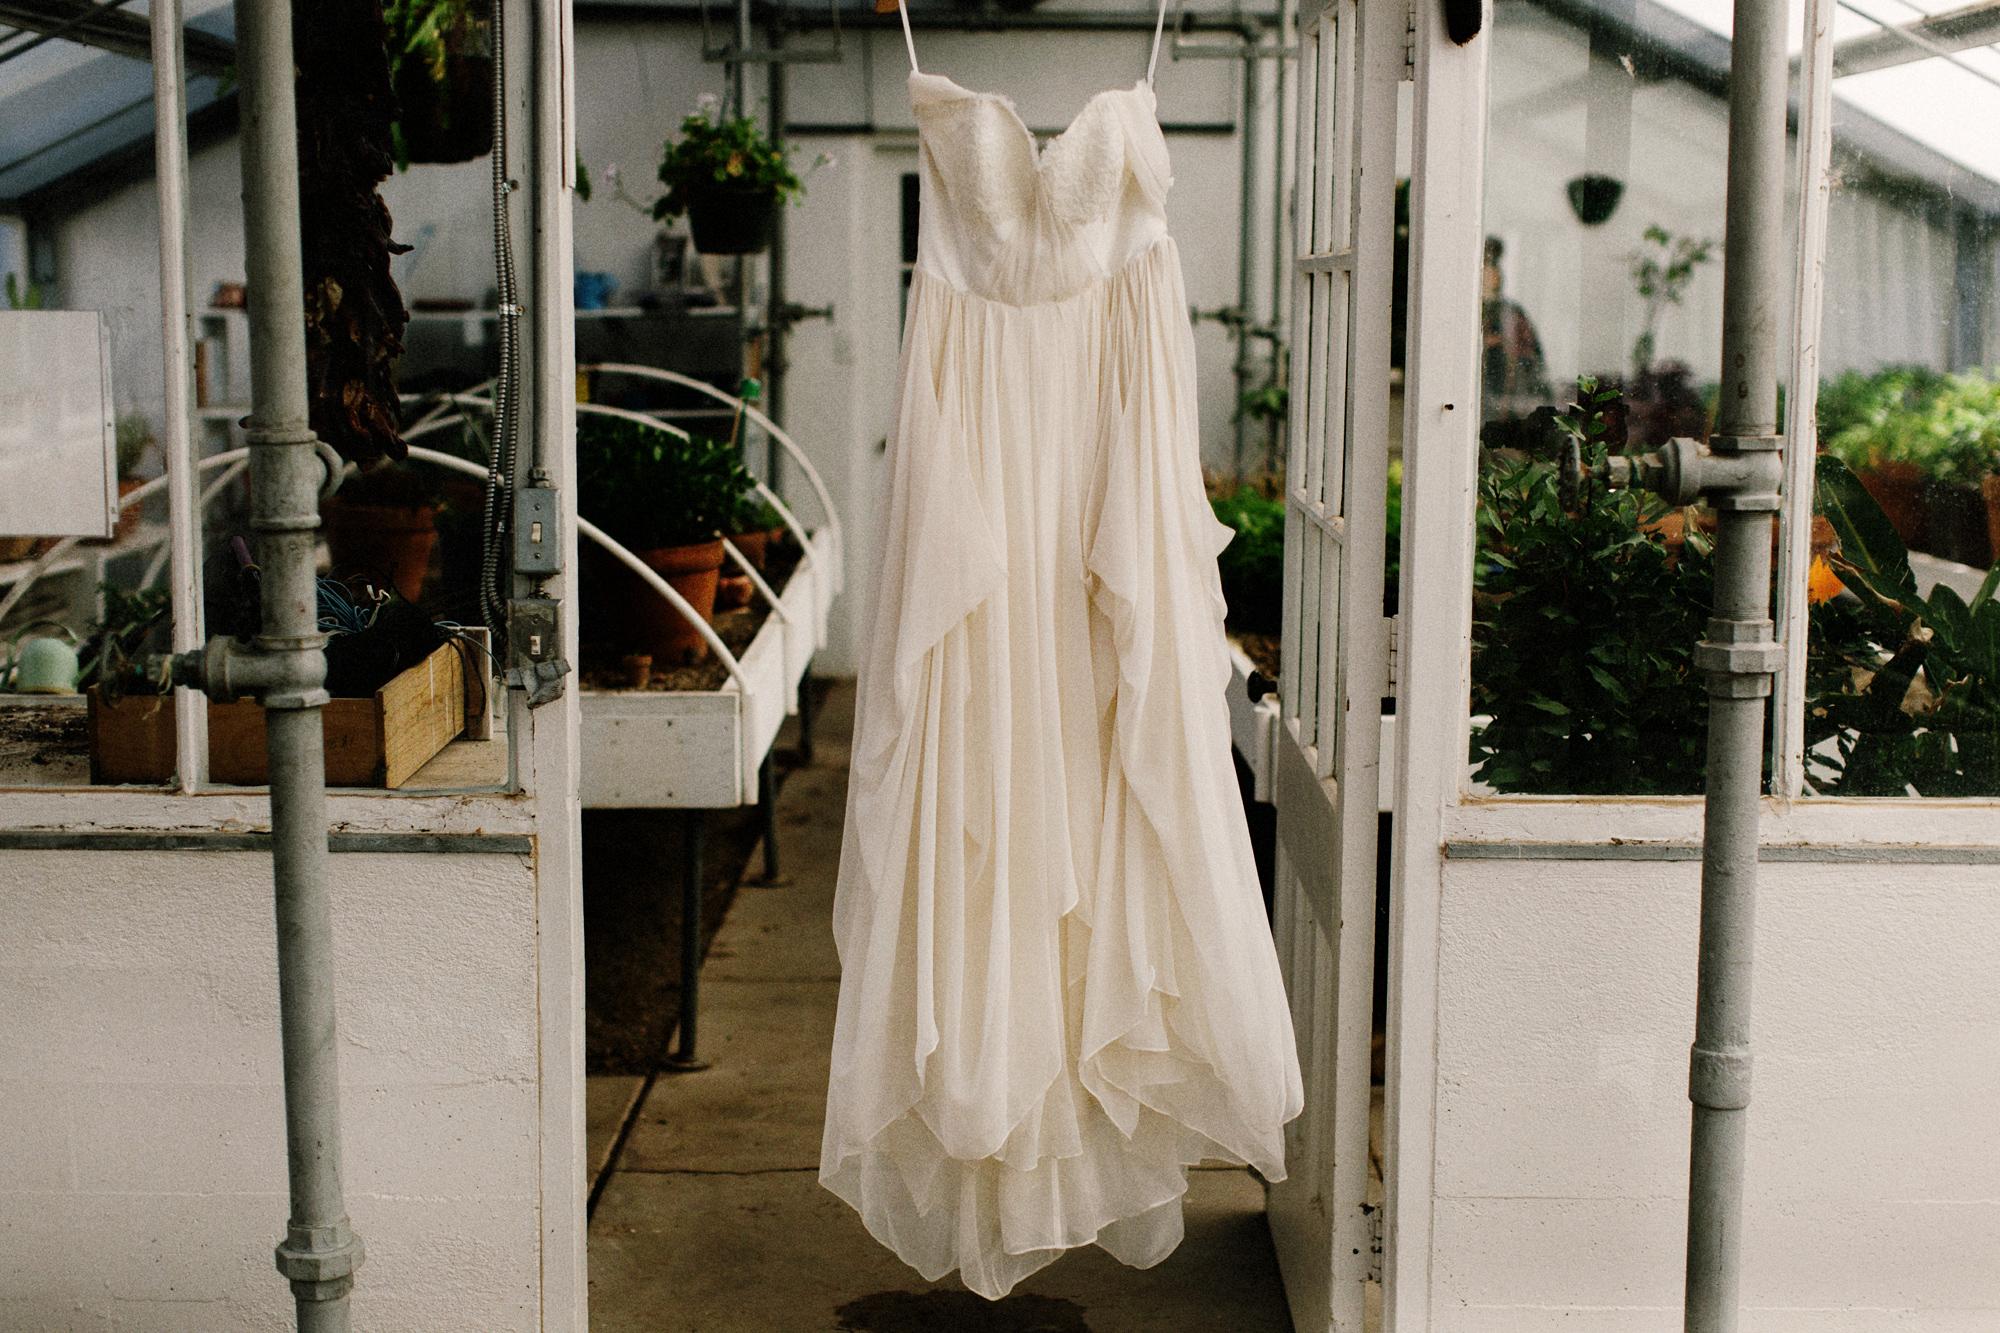 004-los-poblanos-wedding--destination-wedding--wedding-dress.jpg